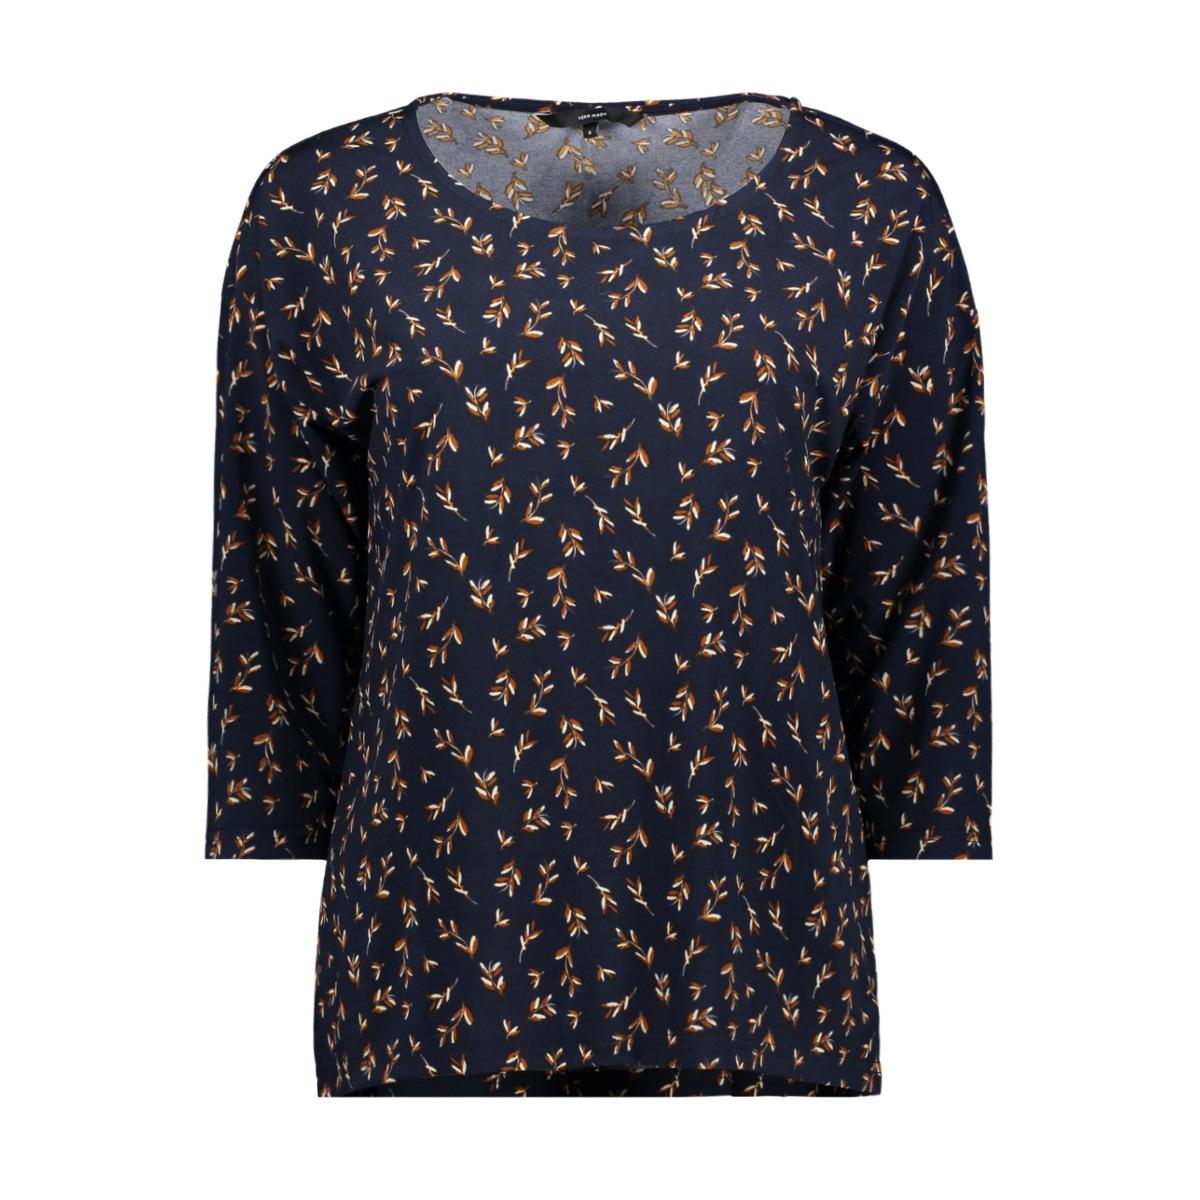 vmtoka 3/4 top jrs 10225629 vero moda t-shirt night sky/aop toka